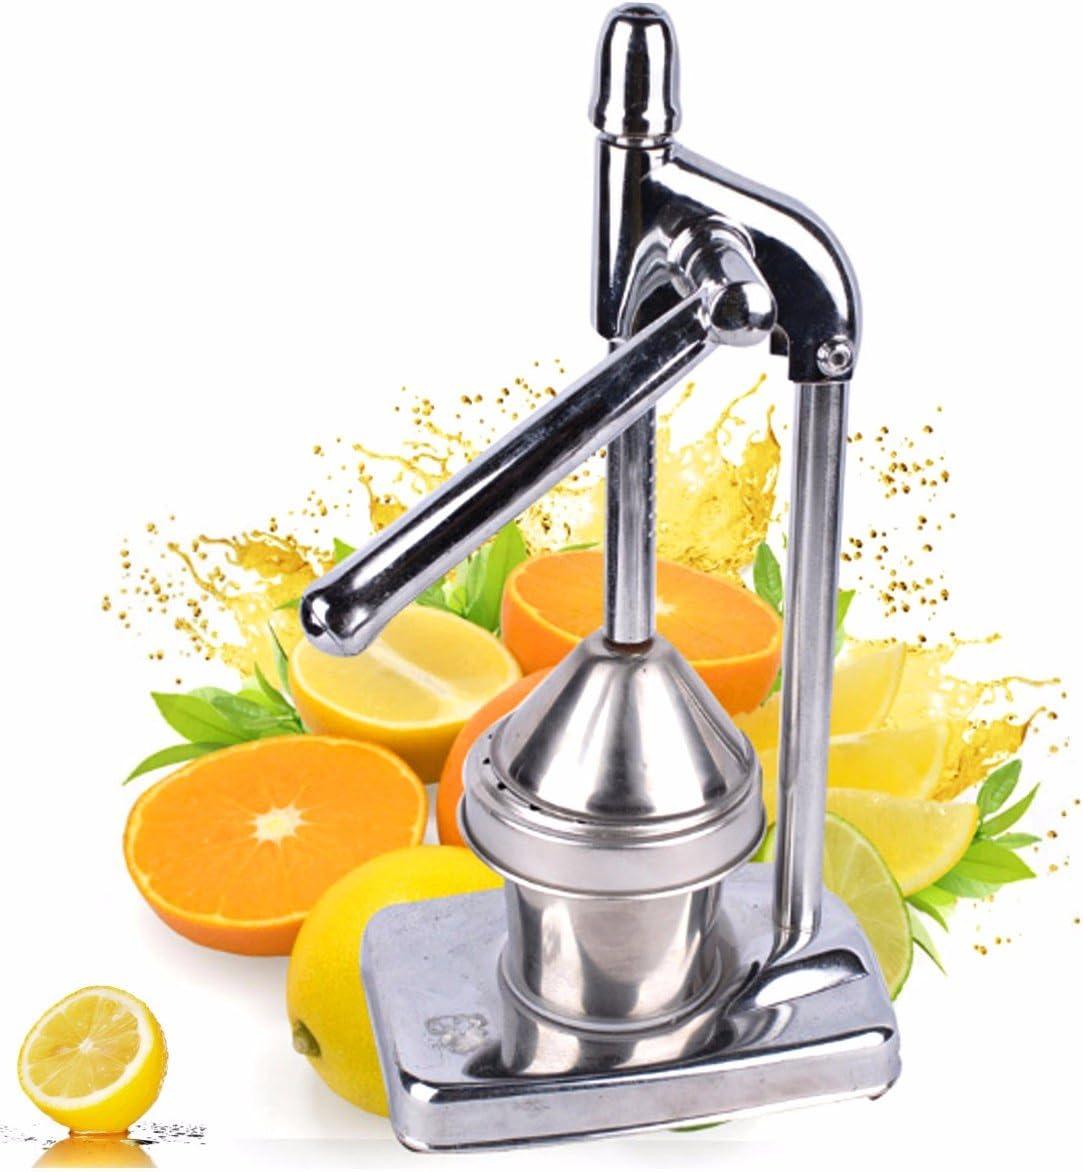 Sevenmore Manual Press Orange San Francisco Mall Citrus Sale SALE% OFF Juice Juicer Extractor Stai